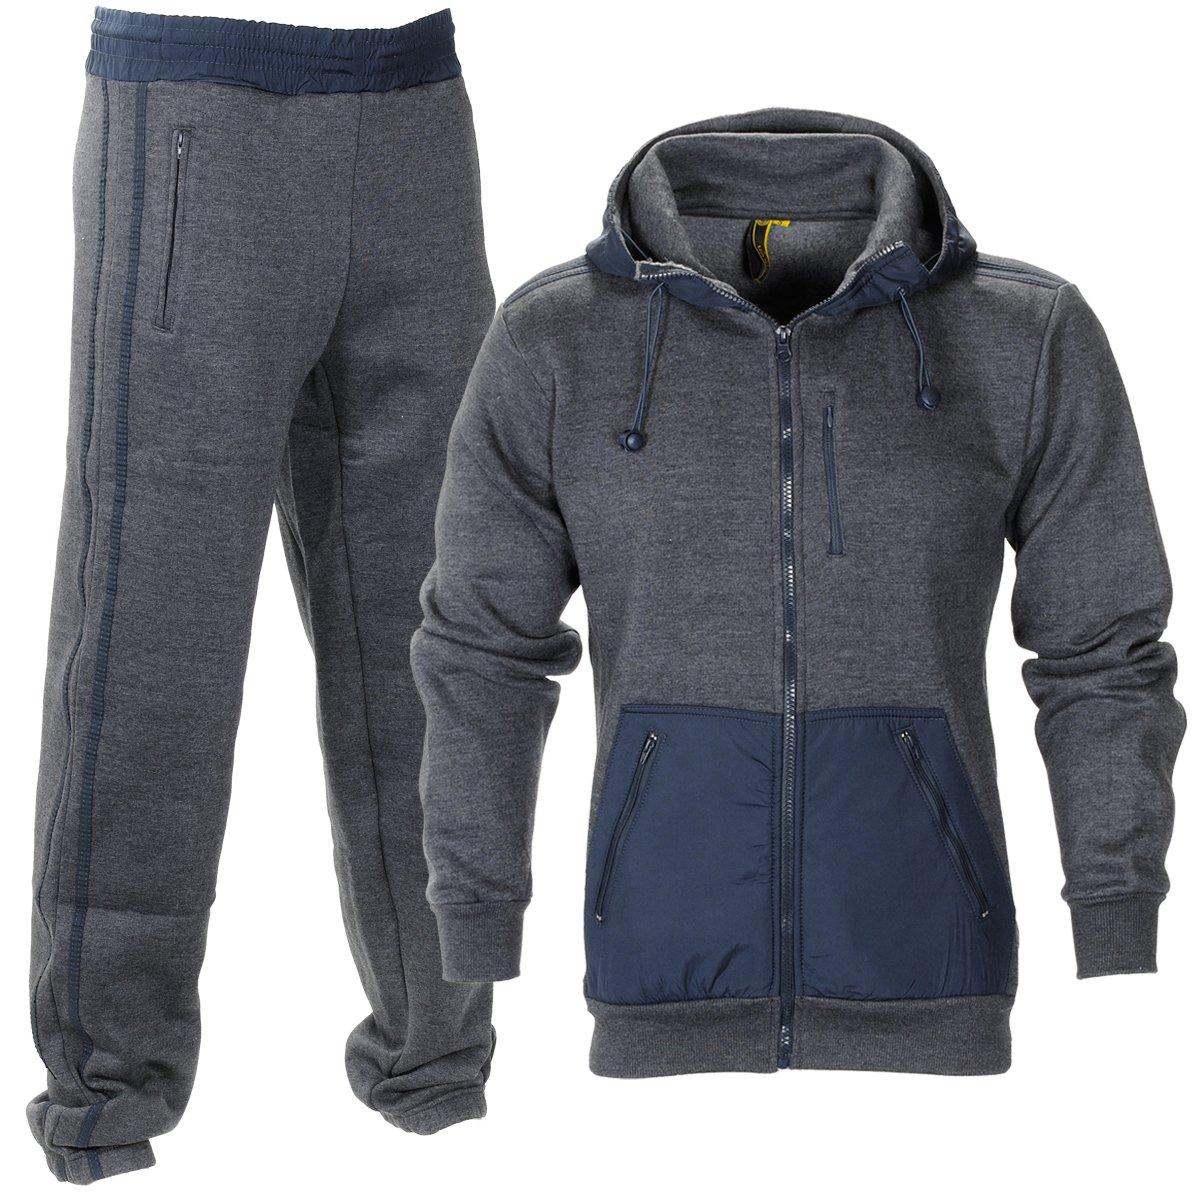 Raiken Essentials Hooded Fleece Team Full Tracksuit Mens Size 5066-TS-Black-S